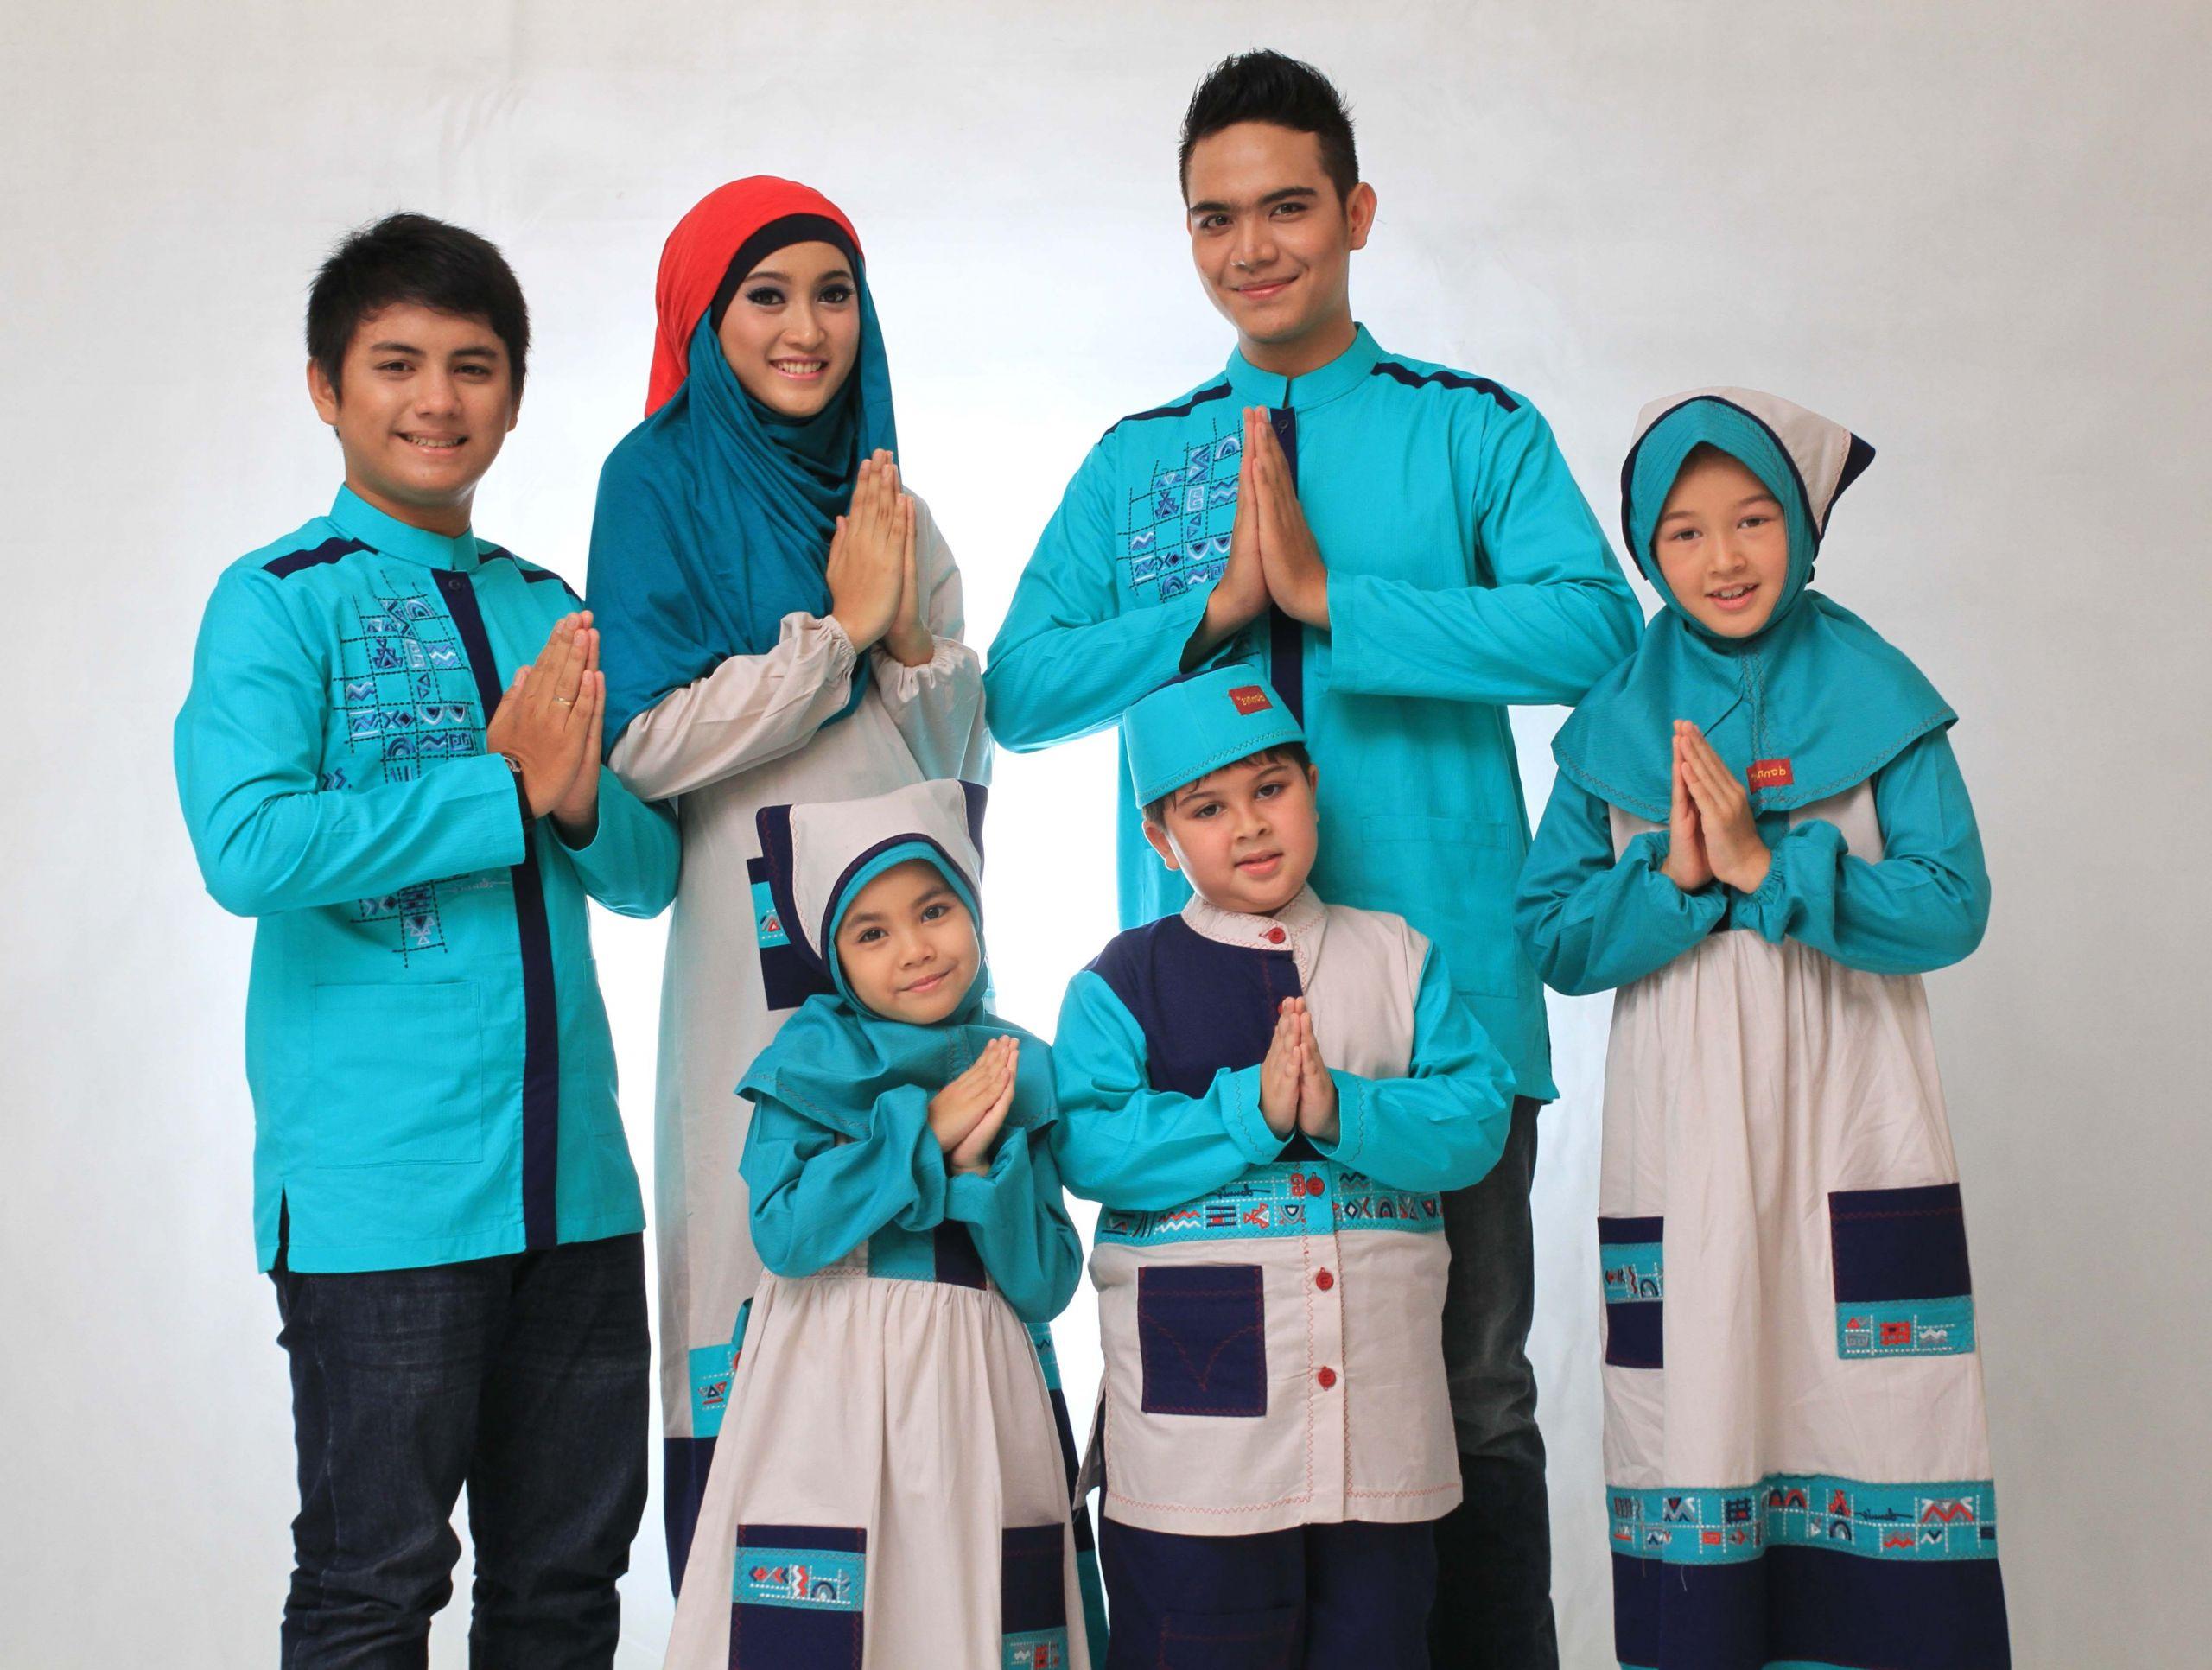 Model Baju Lebaran Keluarga Sby Mndw Baju Muslim Untuk Lebaran Berhijab